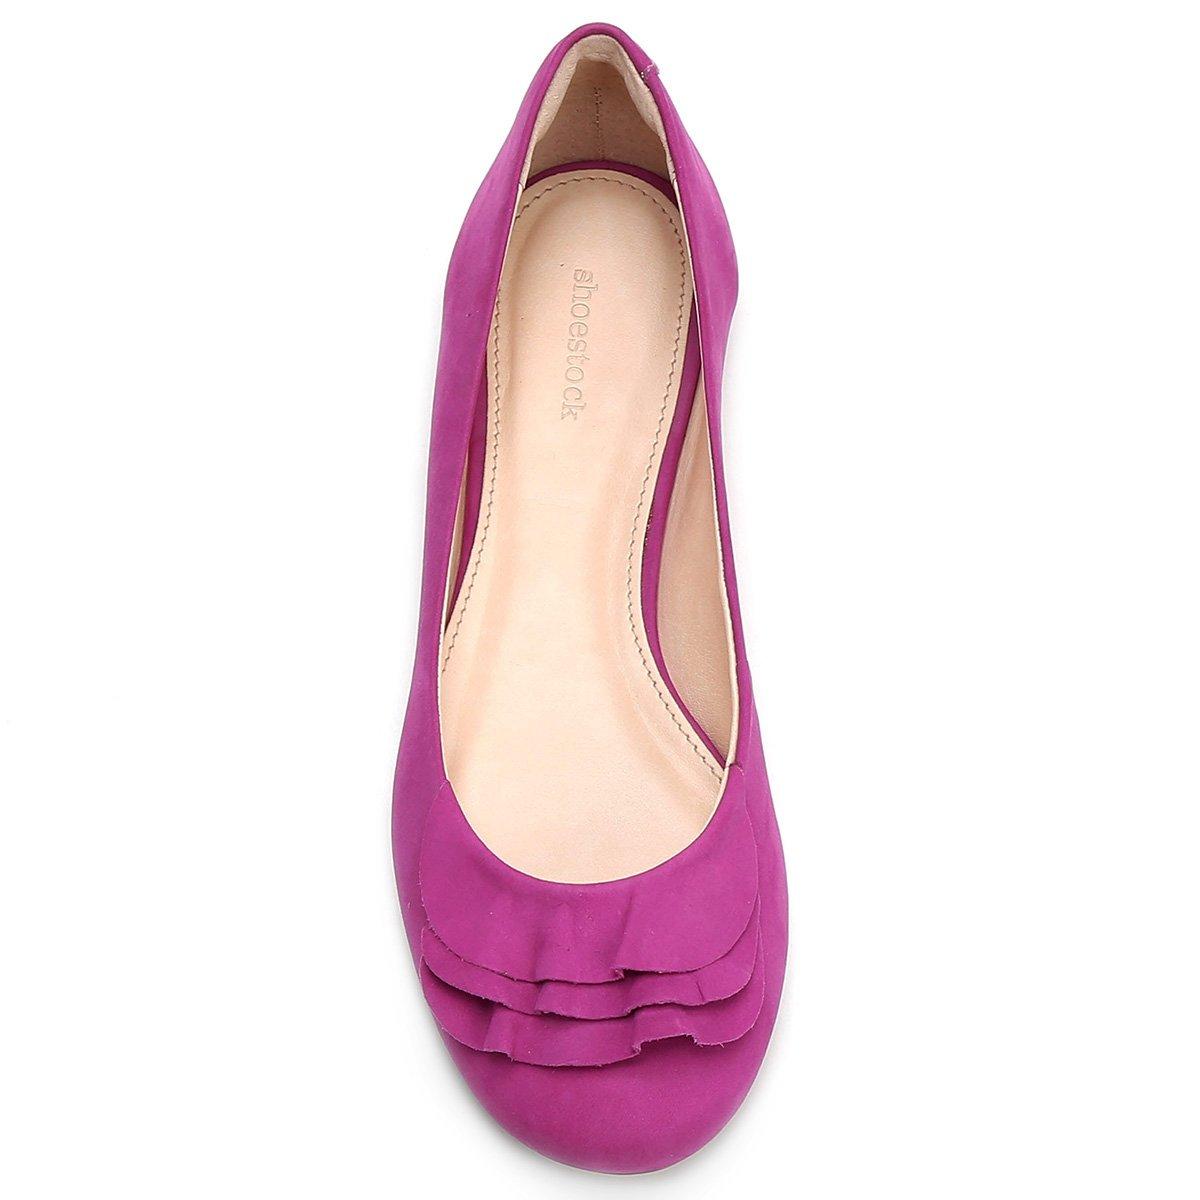 Feminina Sapatilha Babados Shoestock Pink Couro Couro Sapatilha dXwxZRq1q